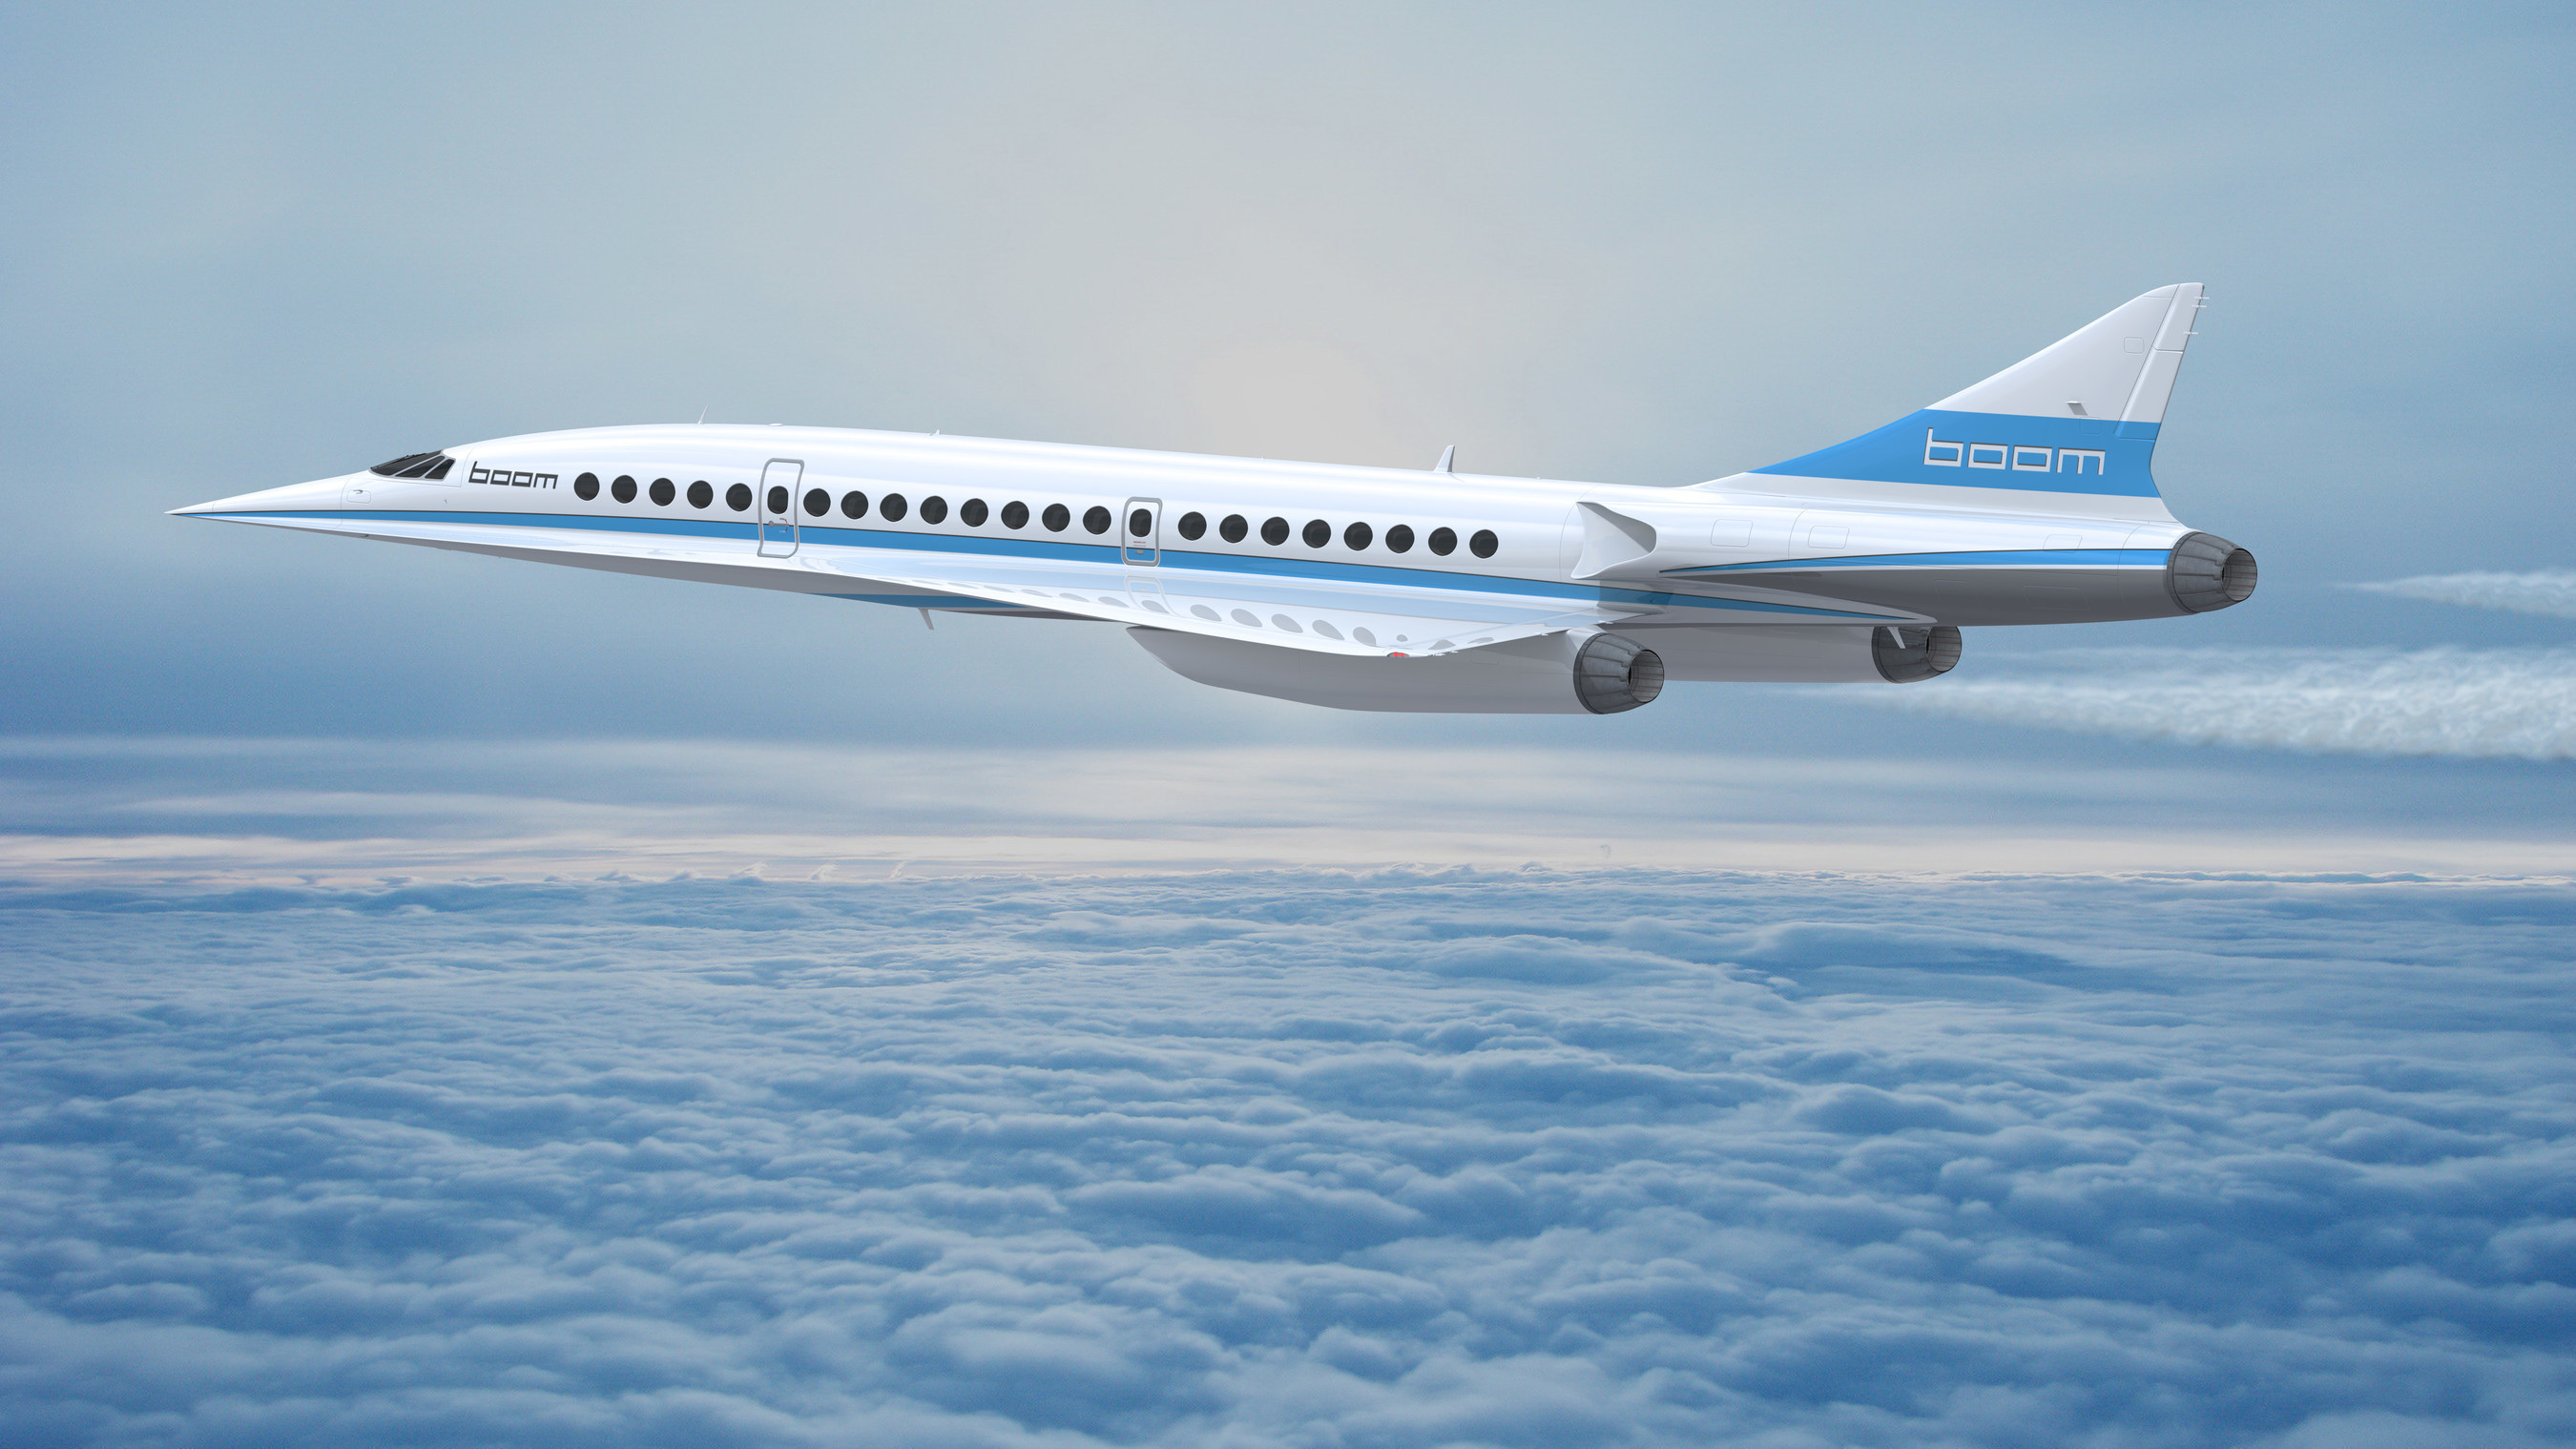 Boom supersonic plane in flight.